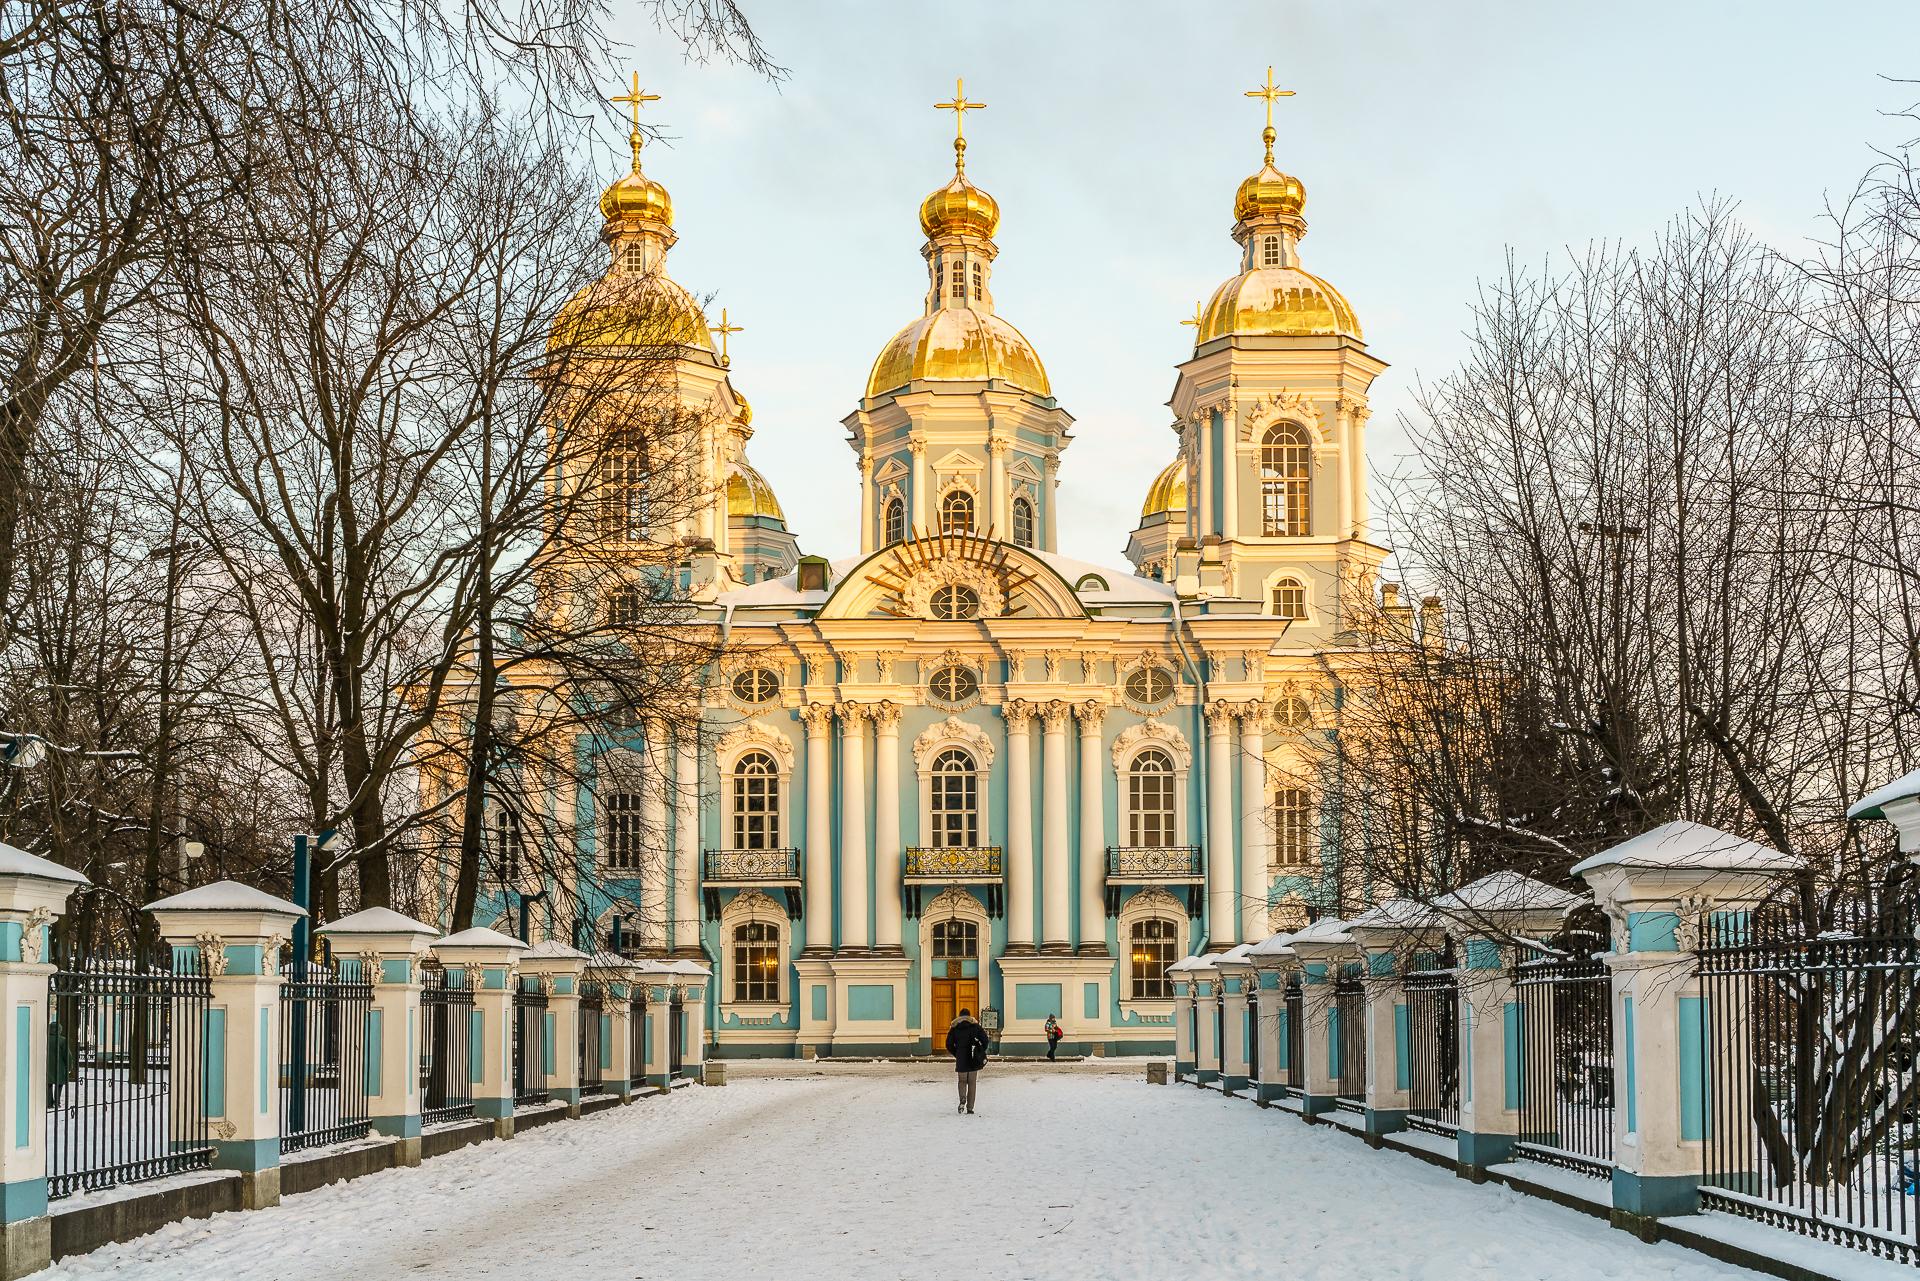 Nikolaus-Marine-Kathedrale-Sankt-Petersburg